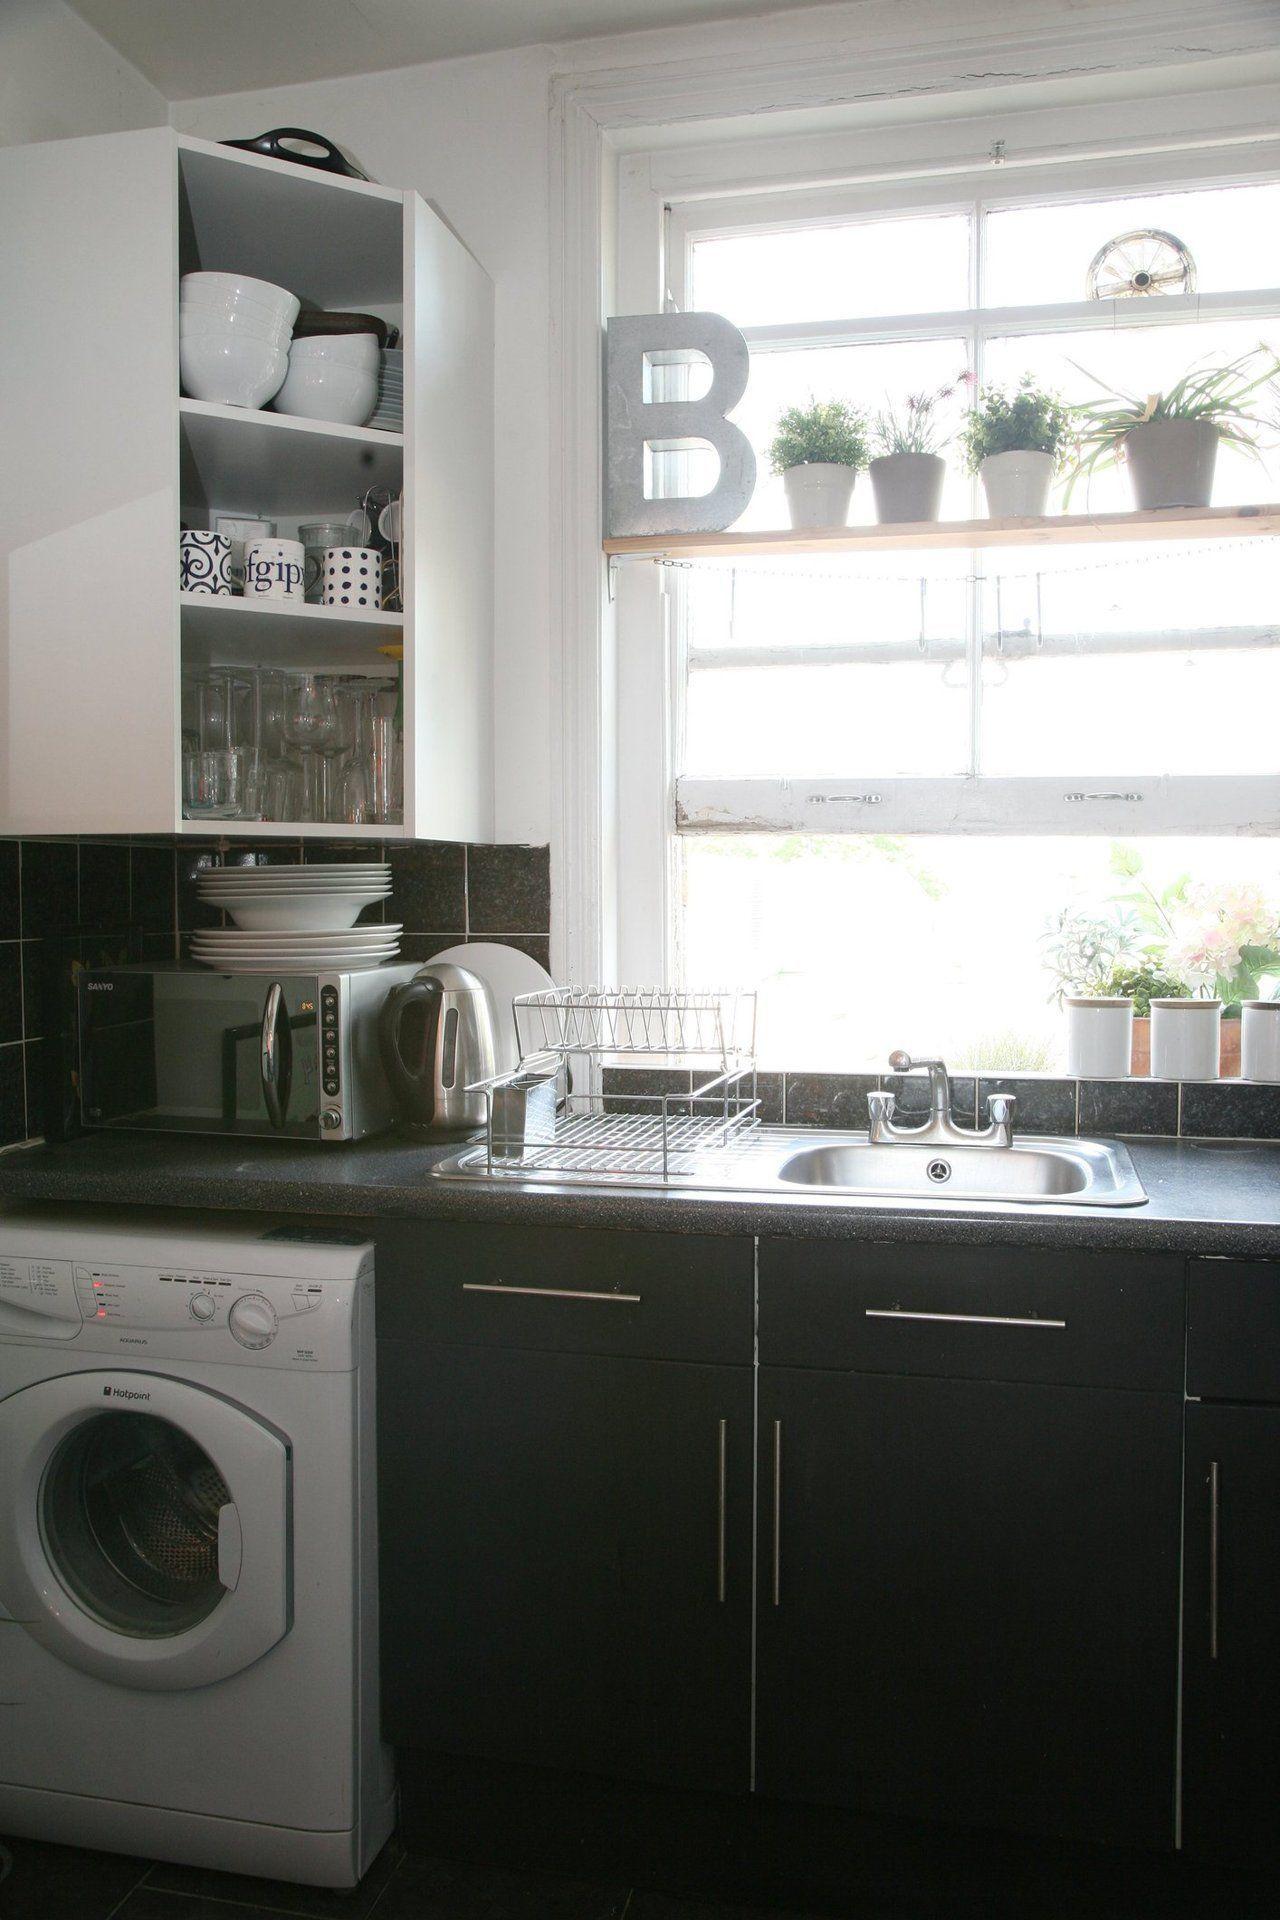 house tour carl ben s modern london flat in 2018 kitchen design rh pinterest com